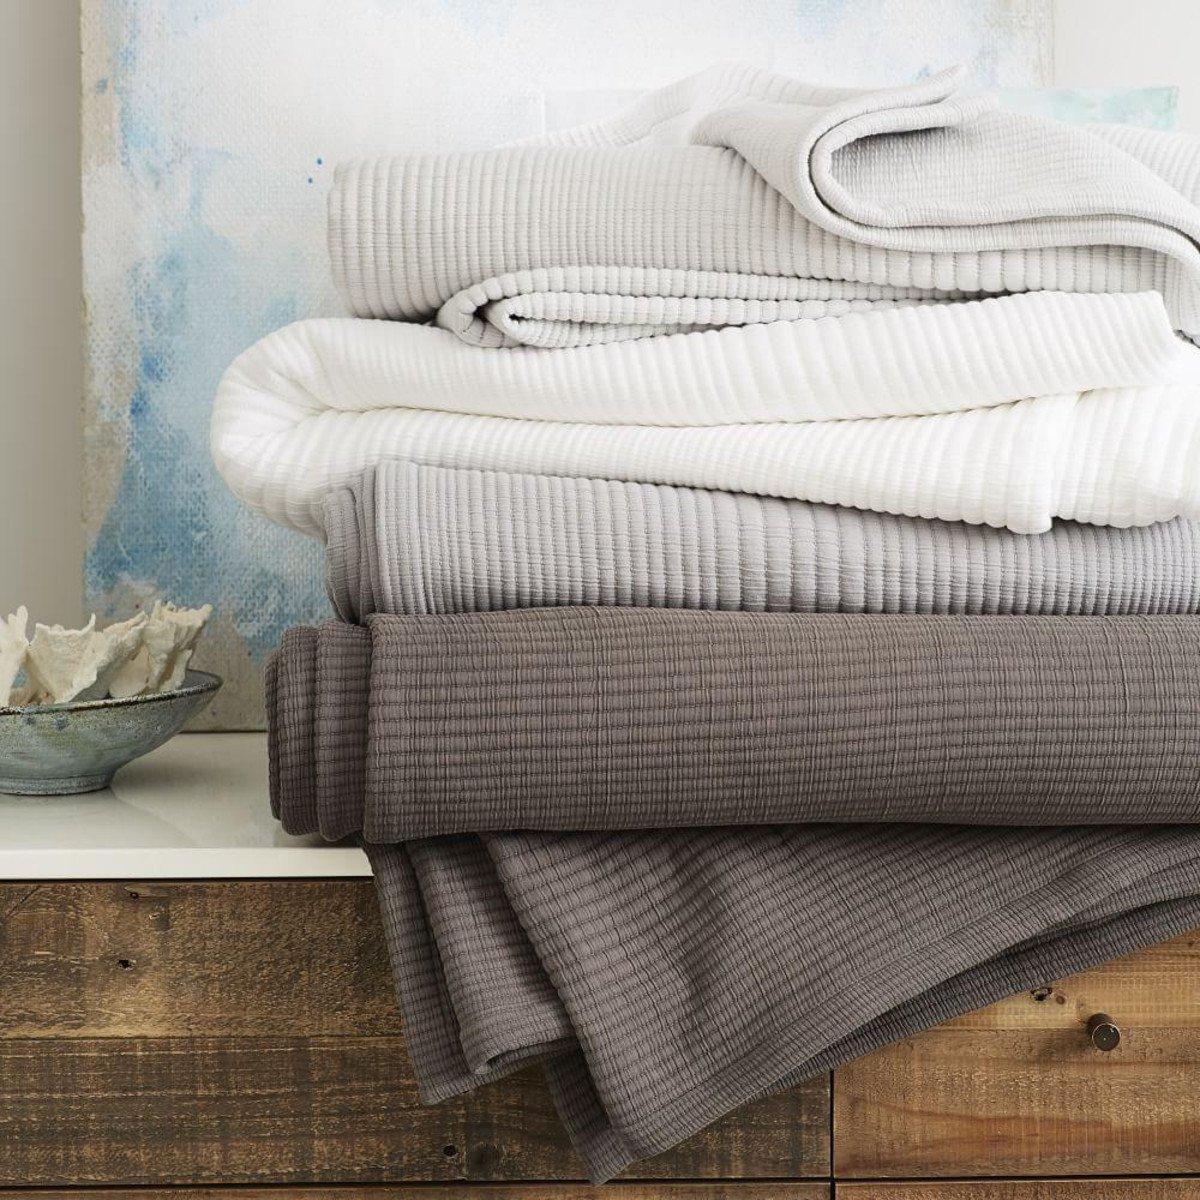 Ribbed Blankets / West Elm